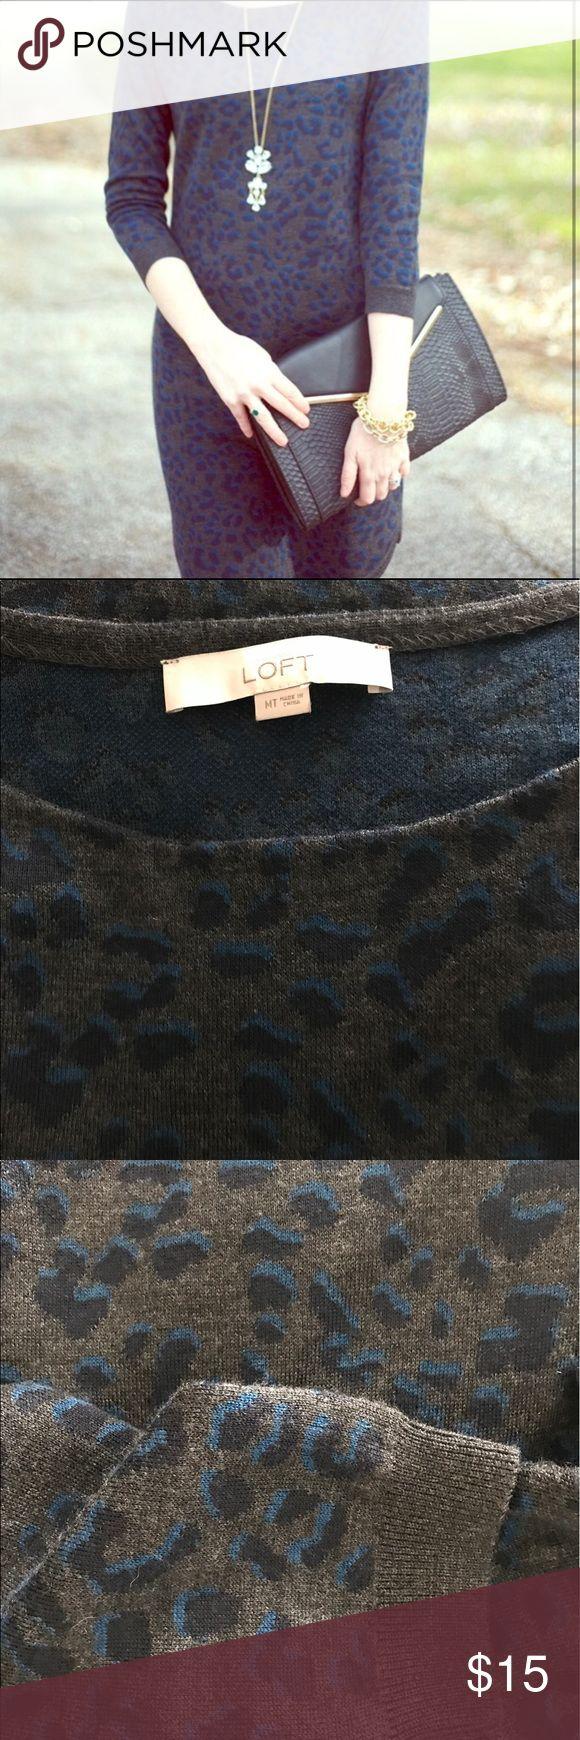 Loft Leopard Sweater Dress Loft Leopard sweater dress, gray with navy and teal spots.  Beautiful construction, shirttail hem. LOFT Dresses Midi